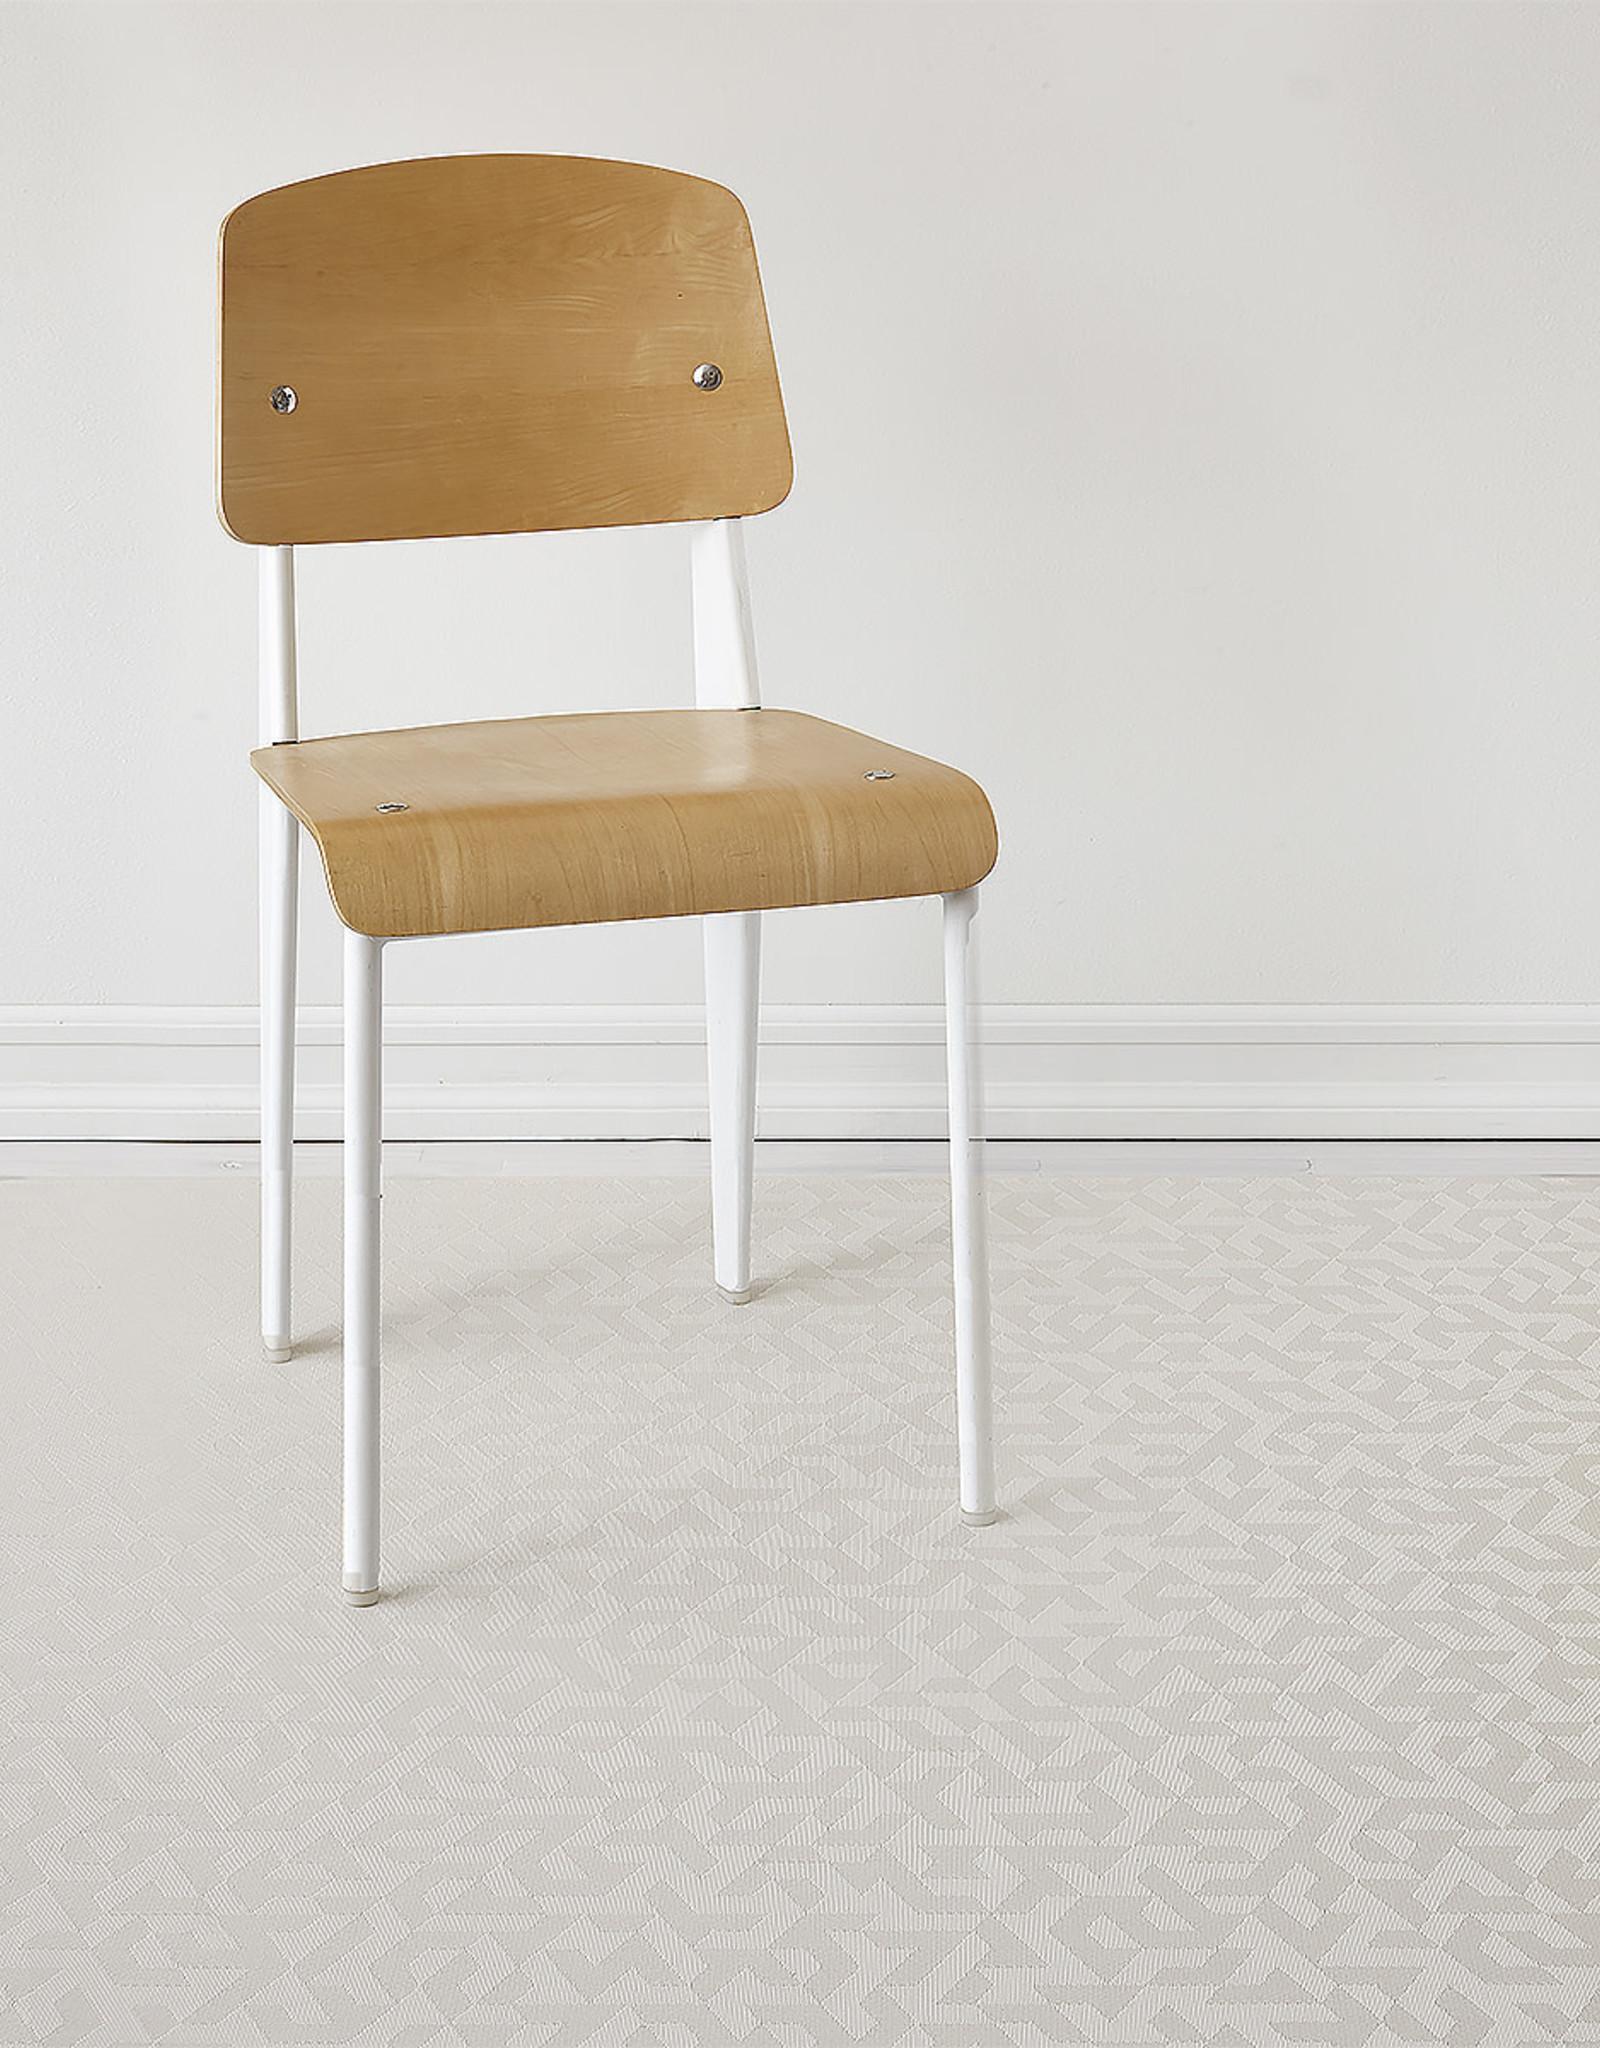 Chilewich Prism Floormat 23X36, NATURAL